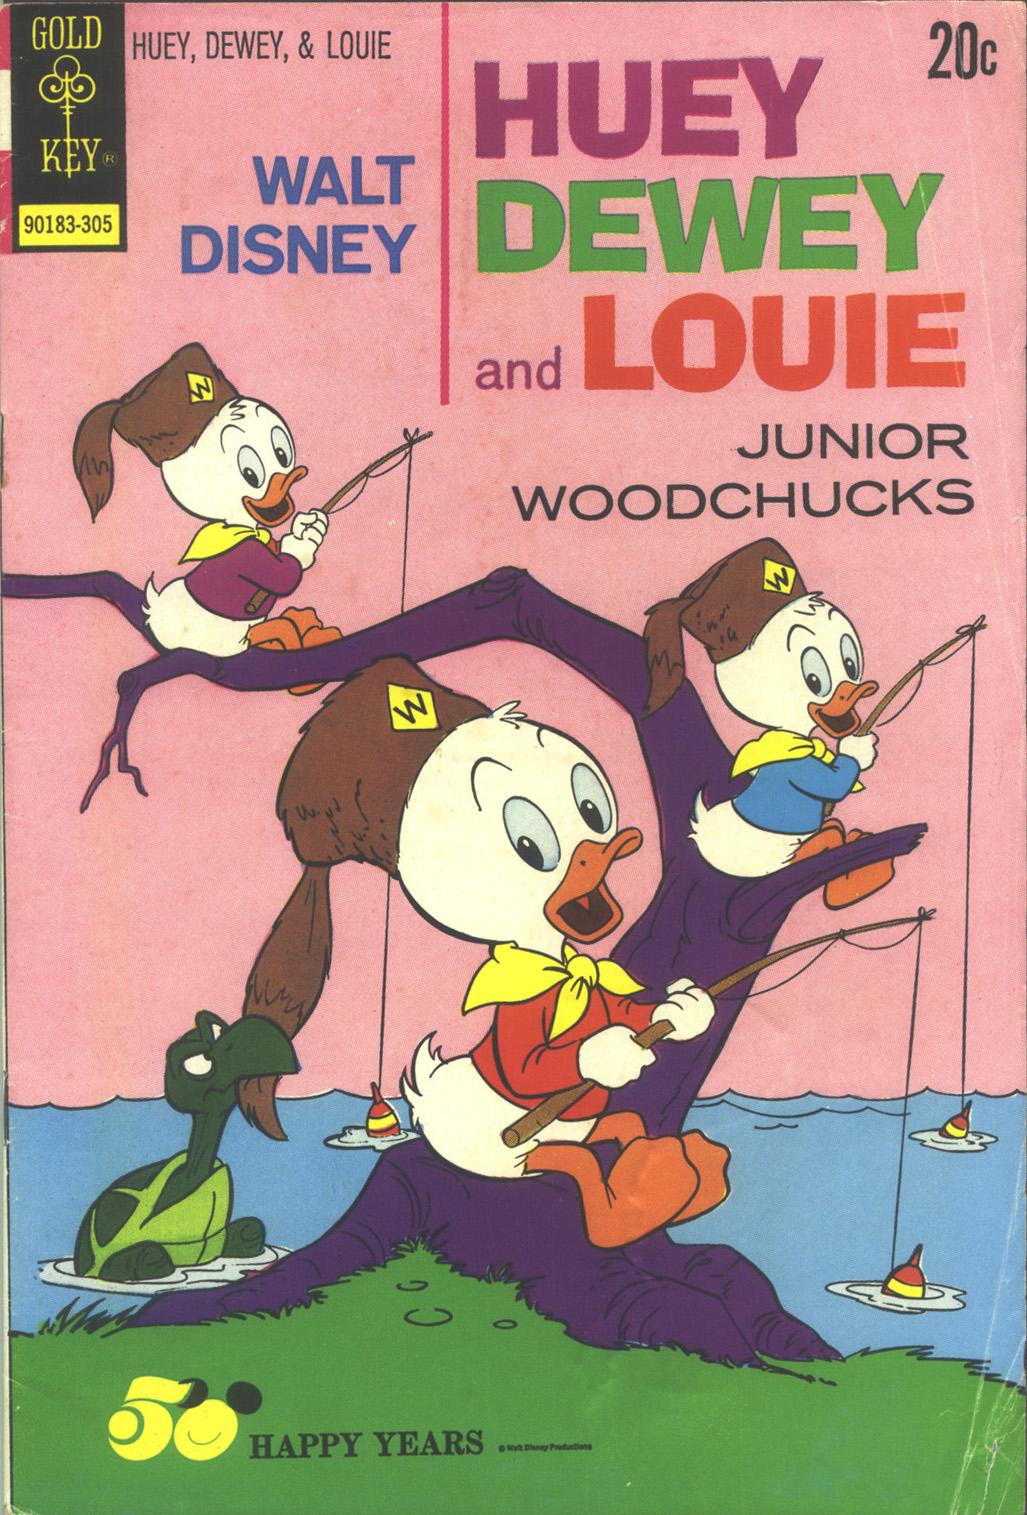 Huey, Dewey, and Louie Junior Woodchucks 20 Page 1